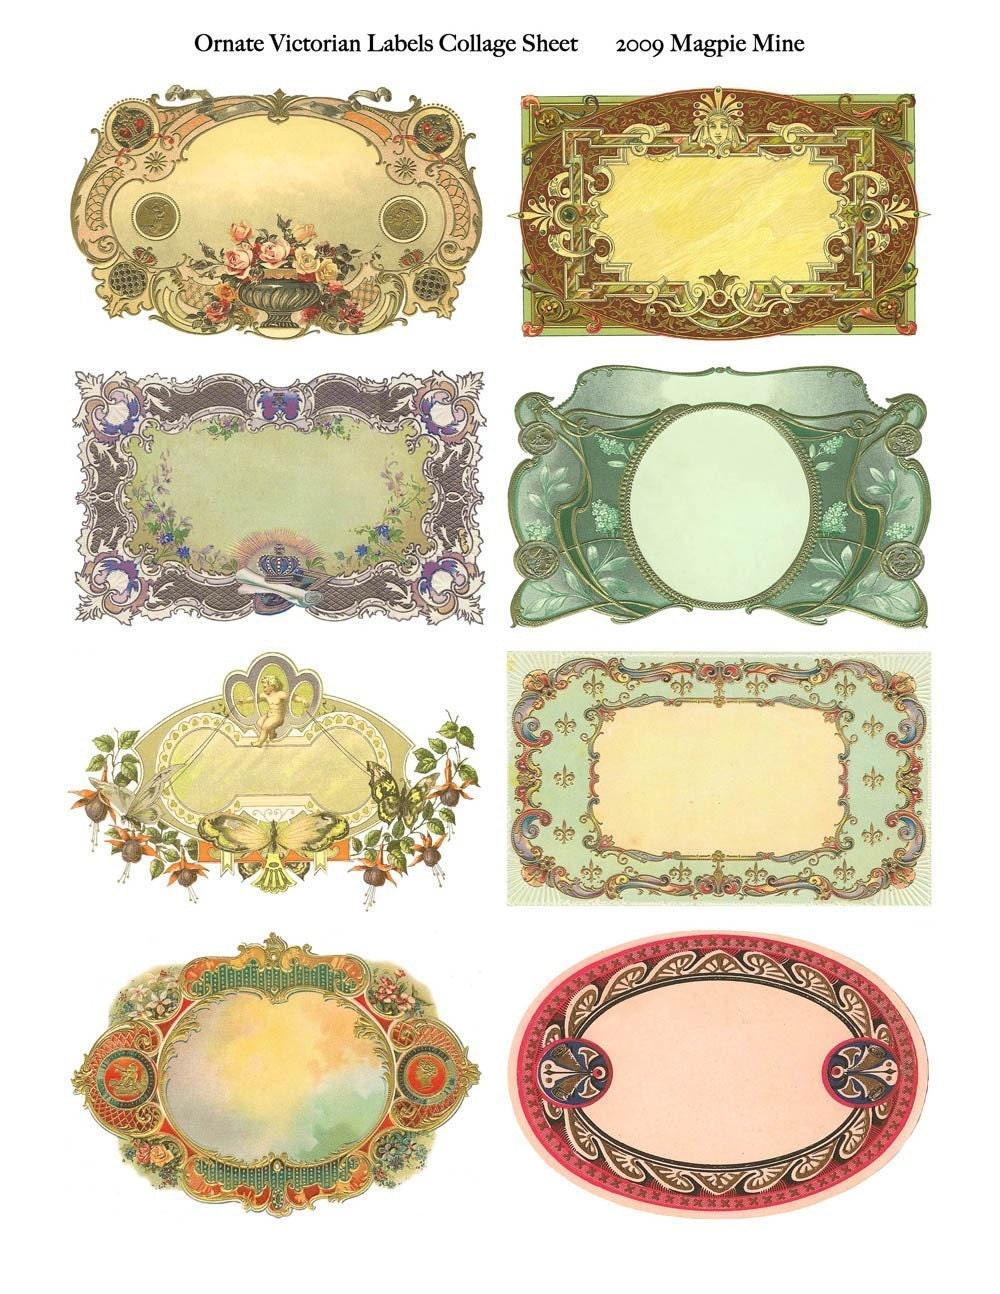 Fancy Label Template Ornate victorian labels